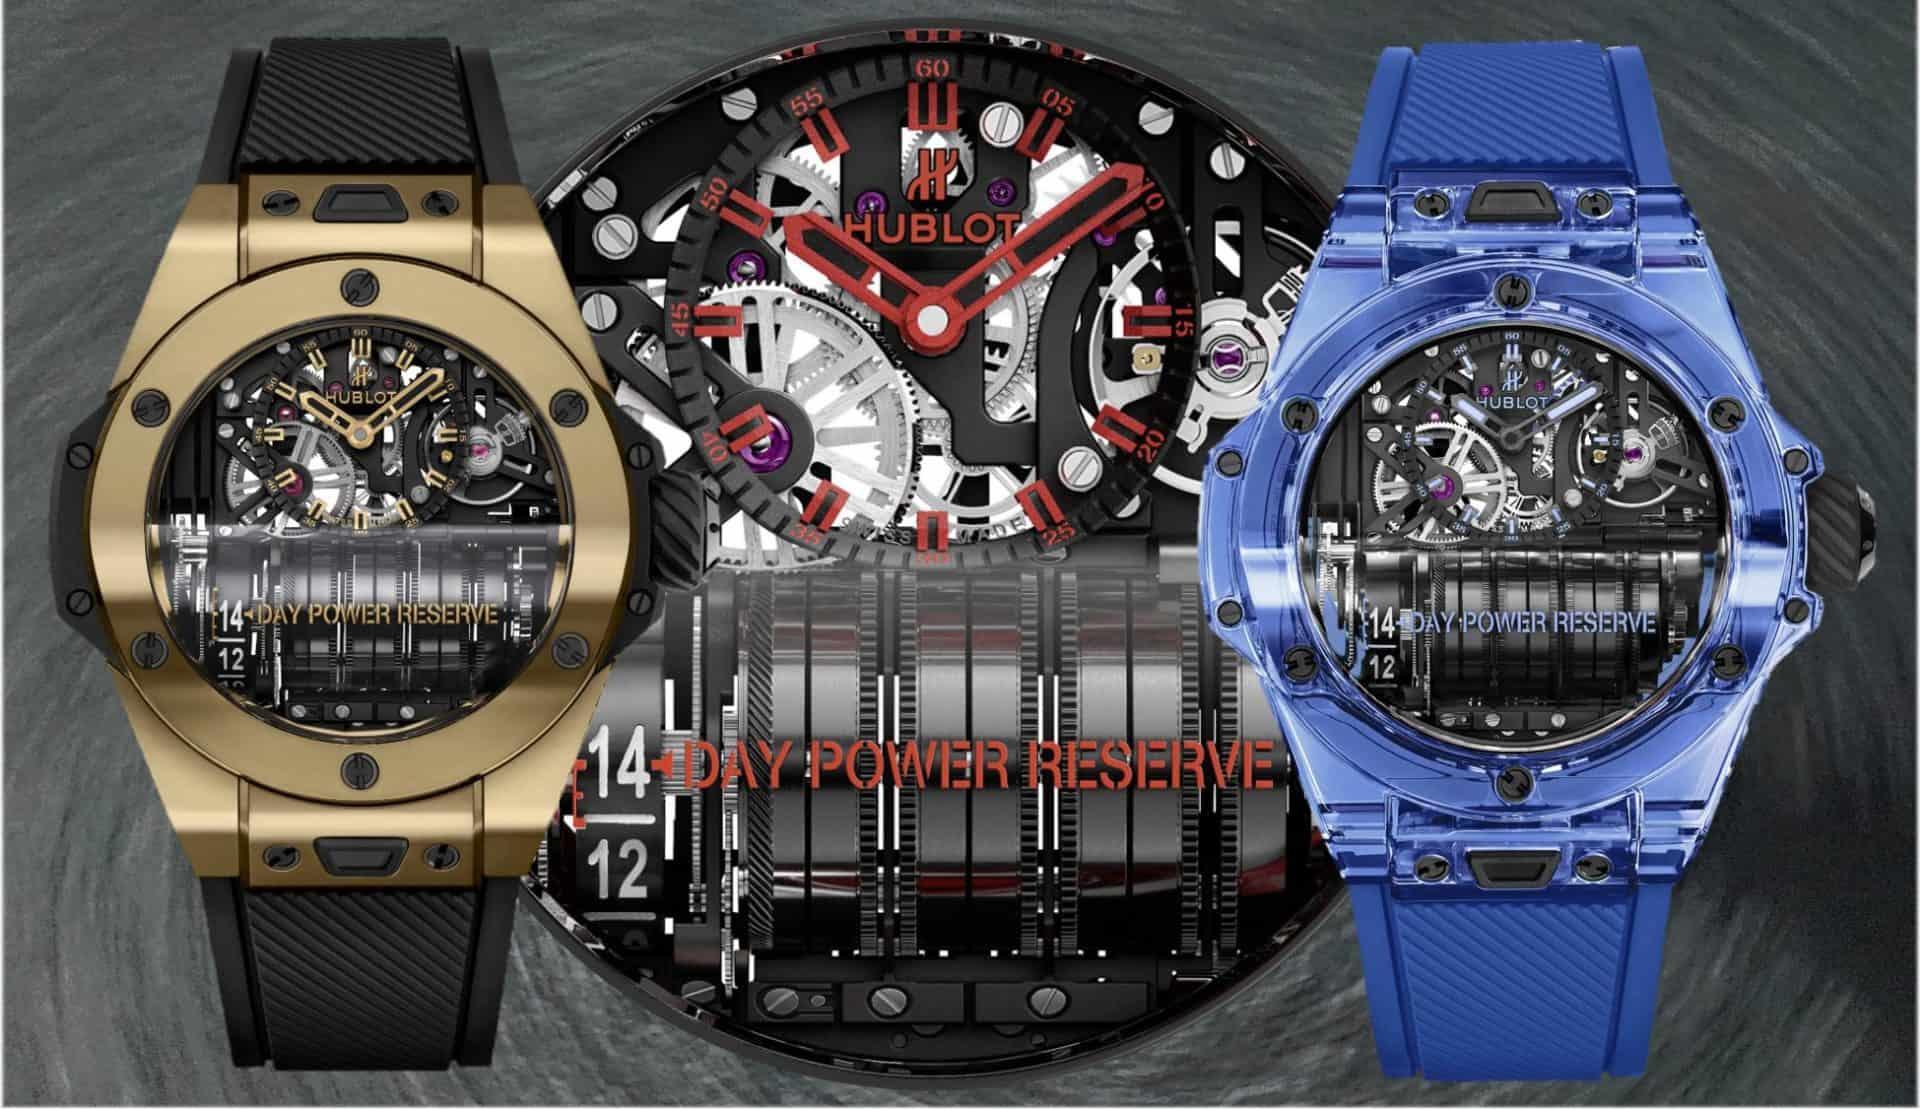 Hublot Big Bang MP-11Hublot Big Bang MP-11 Magic Gold und Blue Sapphire – 2 Reihenmotoren fürs Handgelenk